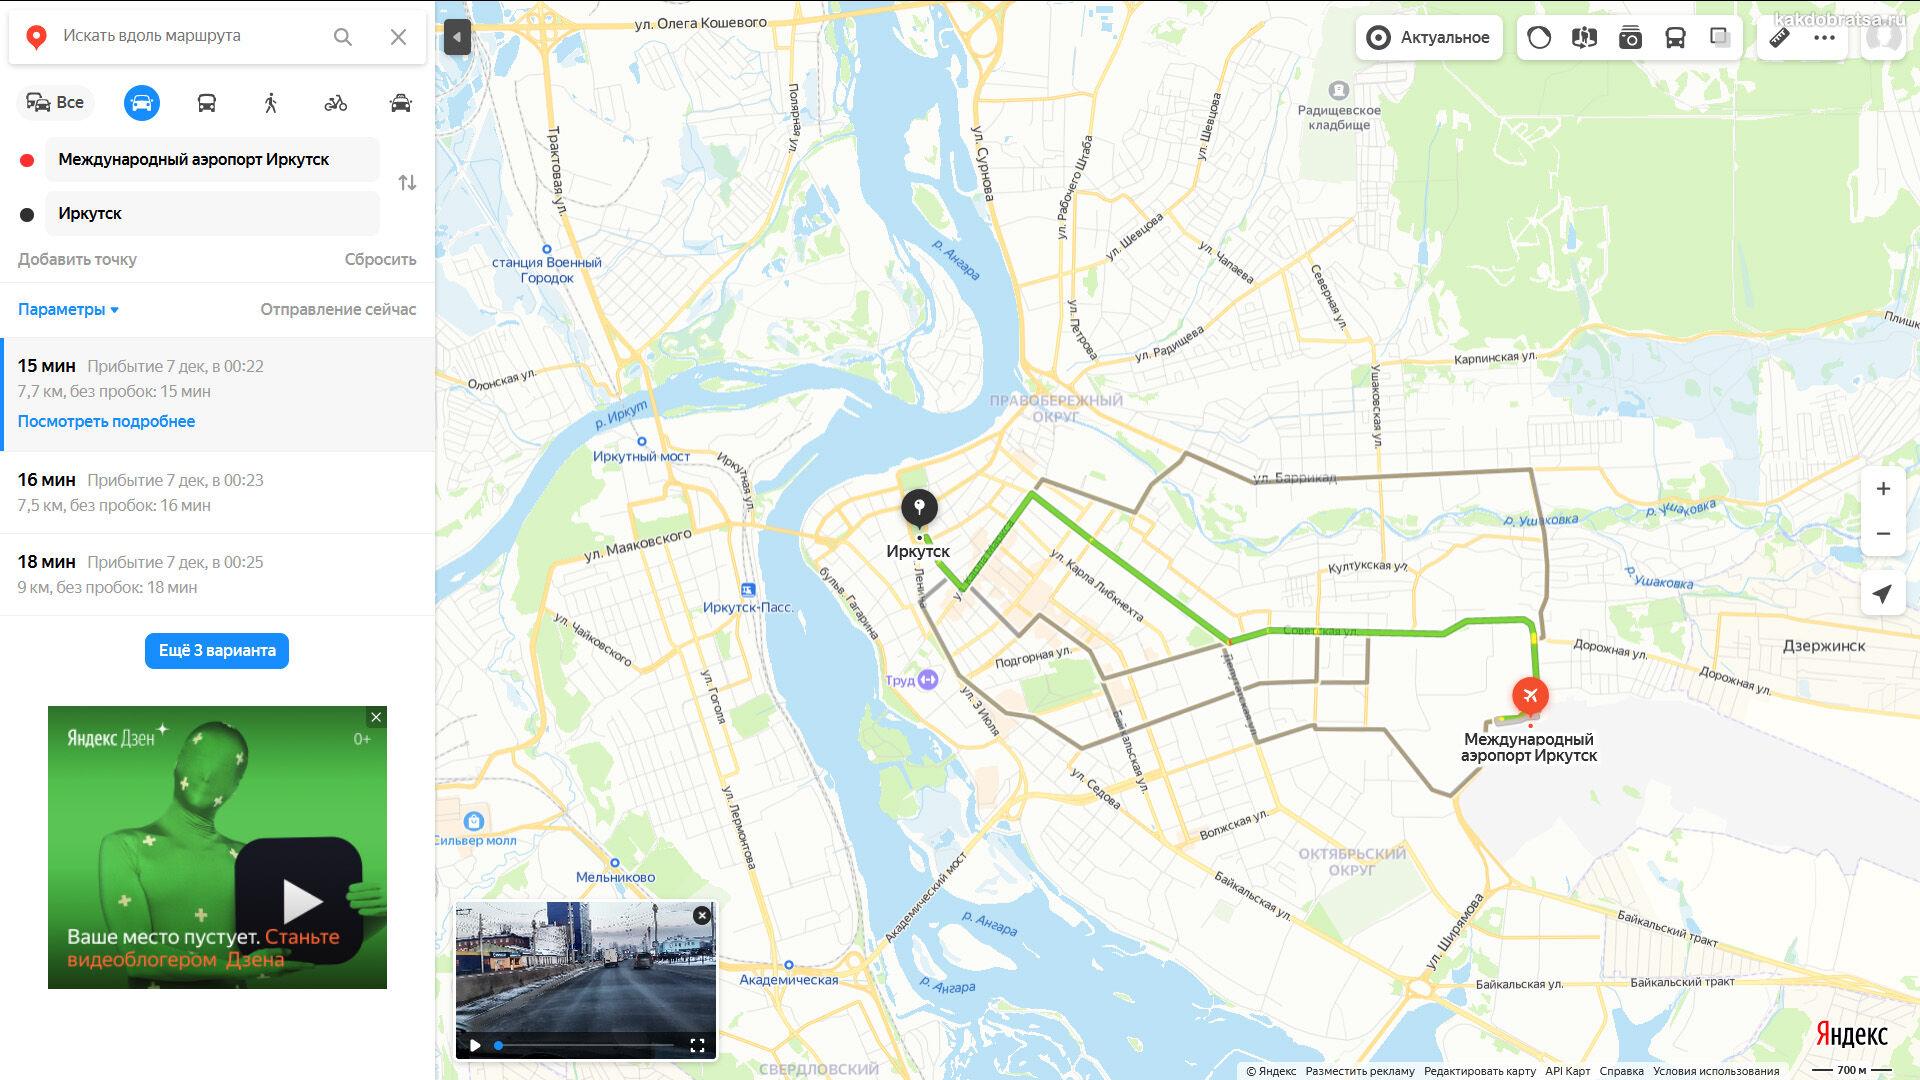 Аэропорт Иркутска на карте где находится